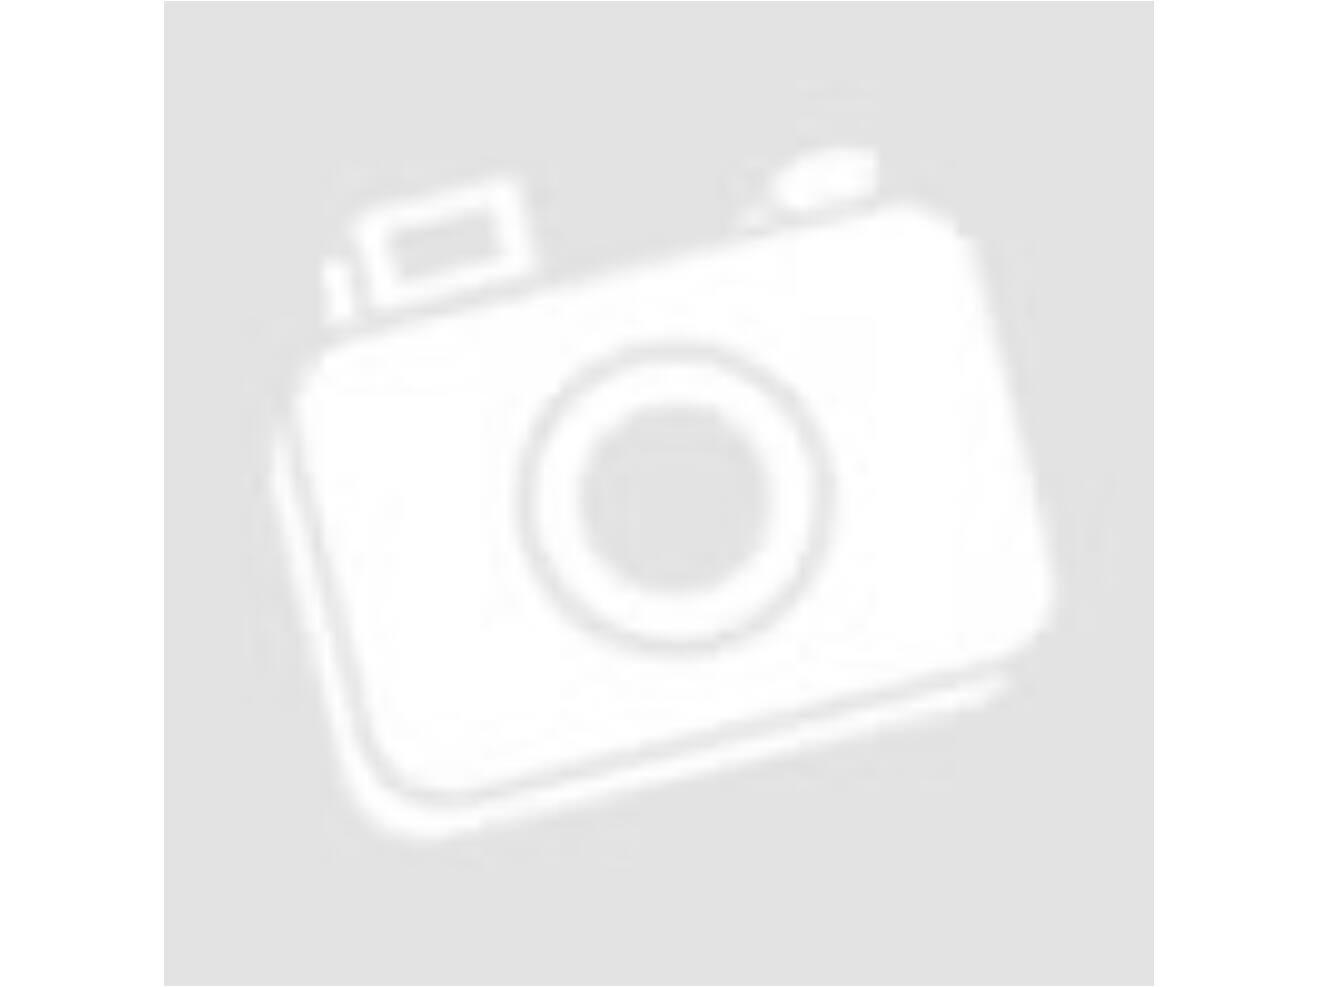 NIKE MAGISTA OBRA FG - FG AG (Műanyag stoplis) - Alexandersoccershoes 36aee8c3df